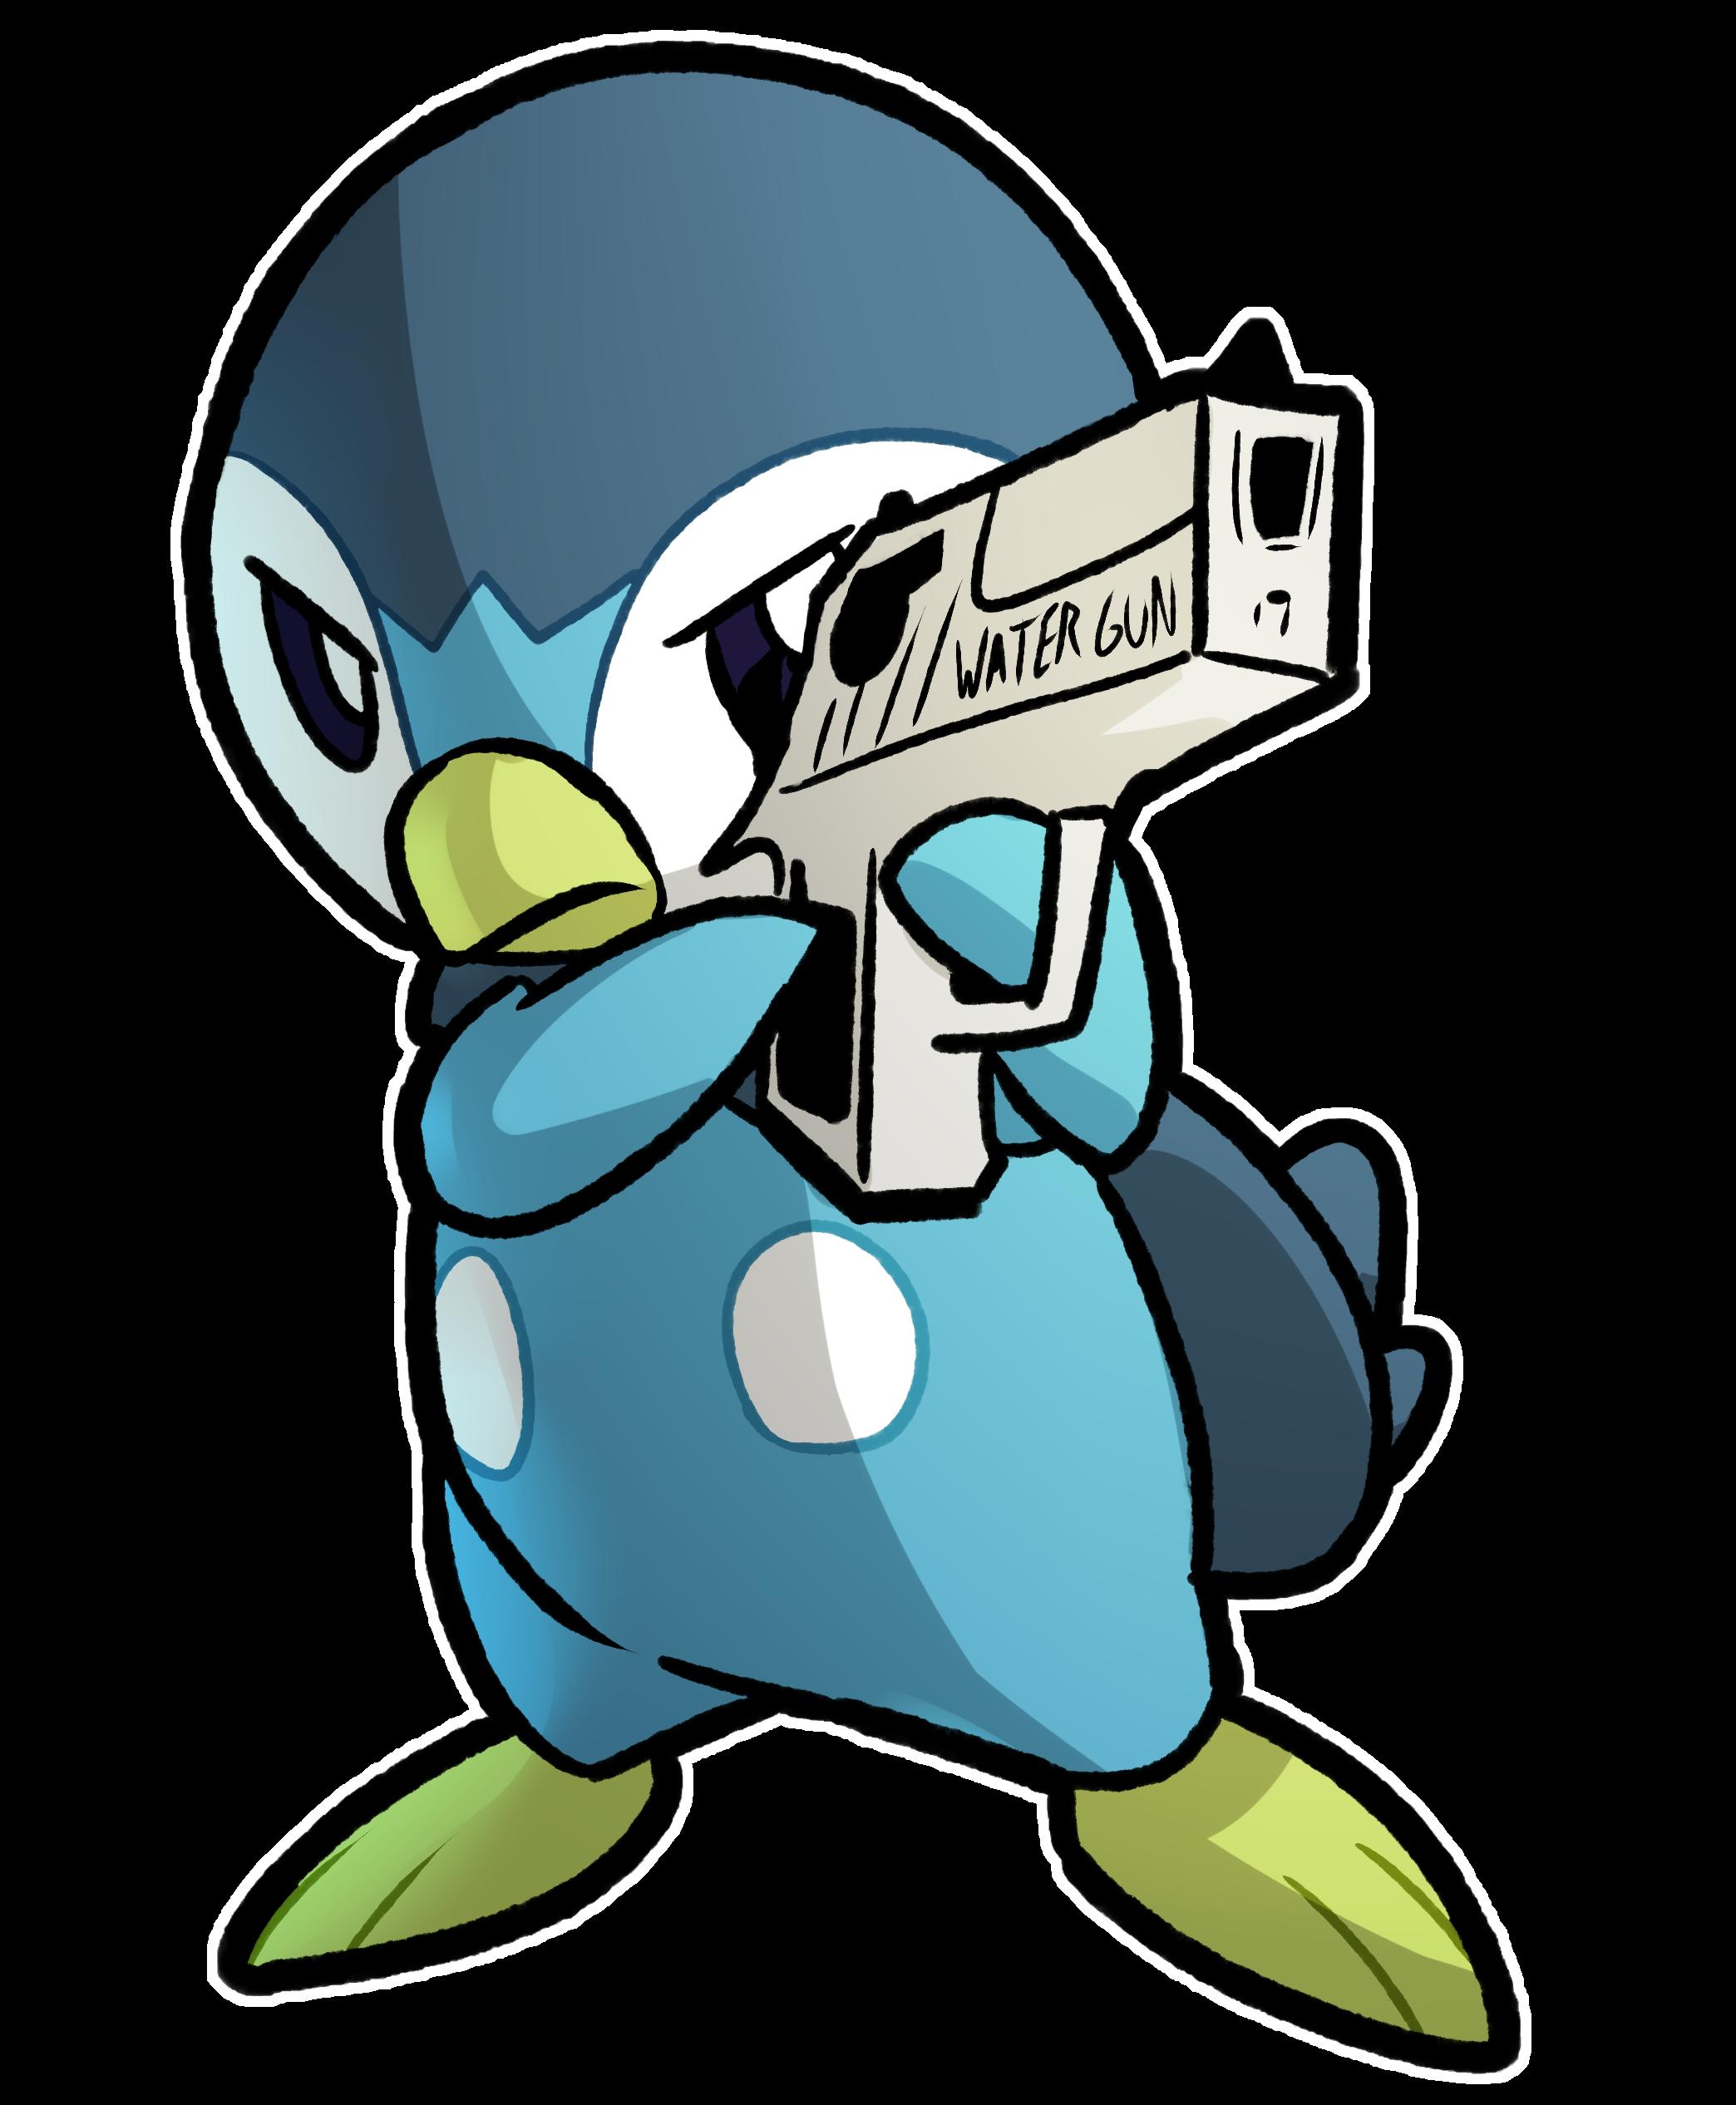 Using water gun if. Pokemon clipart piplup